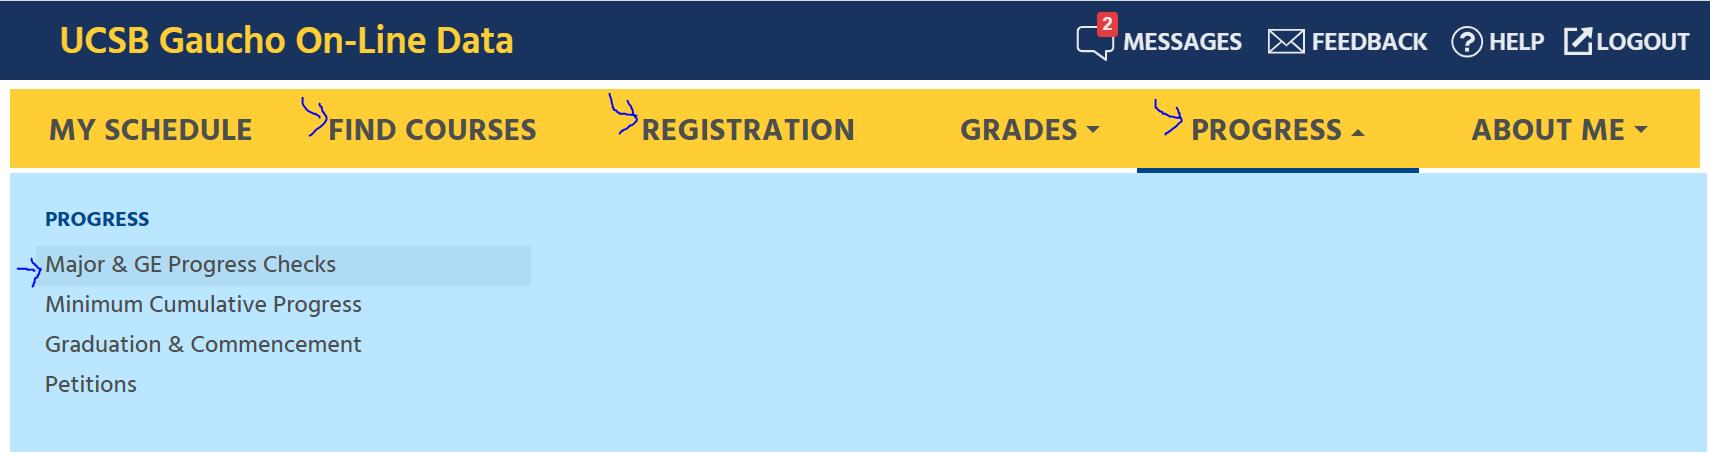 Ucsb Academic Calendar 2022.Undergraduate Registration Resources Department Of Global Studies Uc Santa Barbara